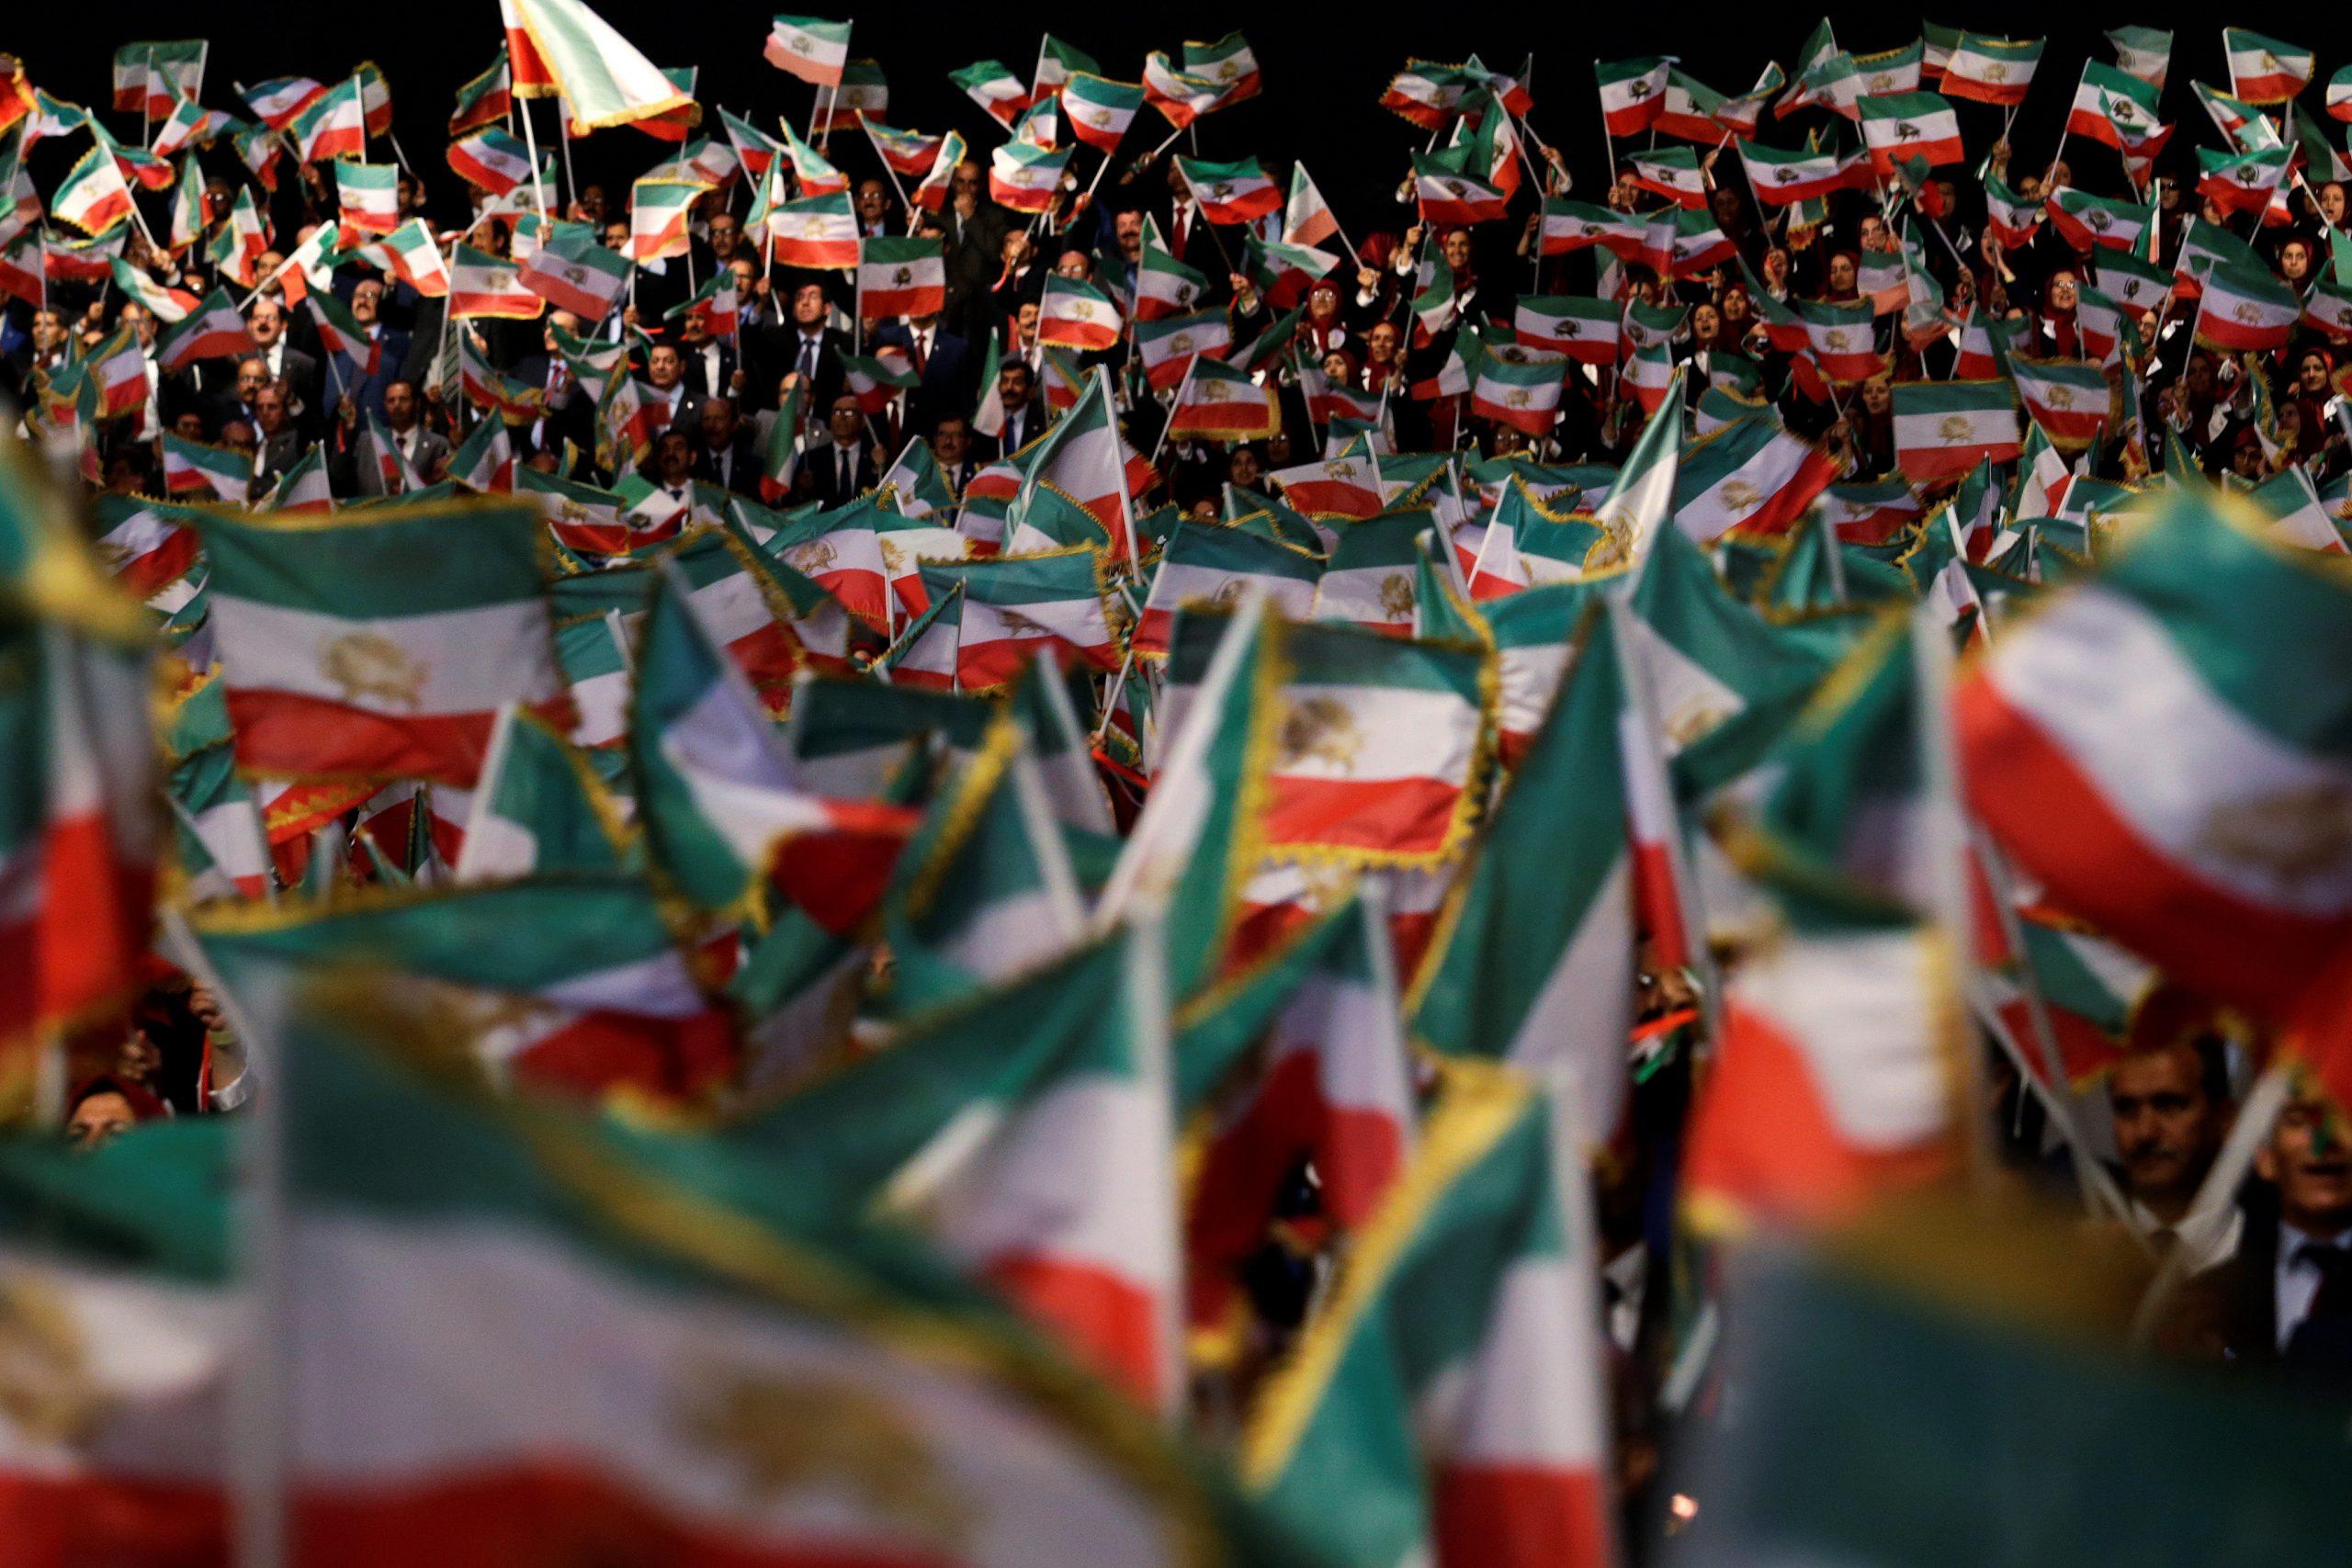 MEK Iran's protests for free Iran